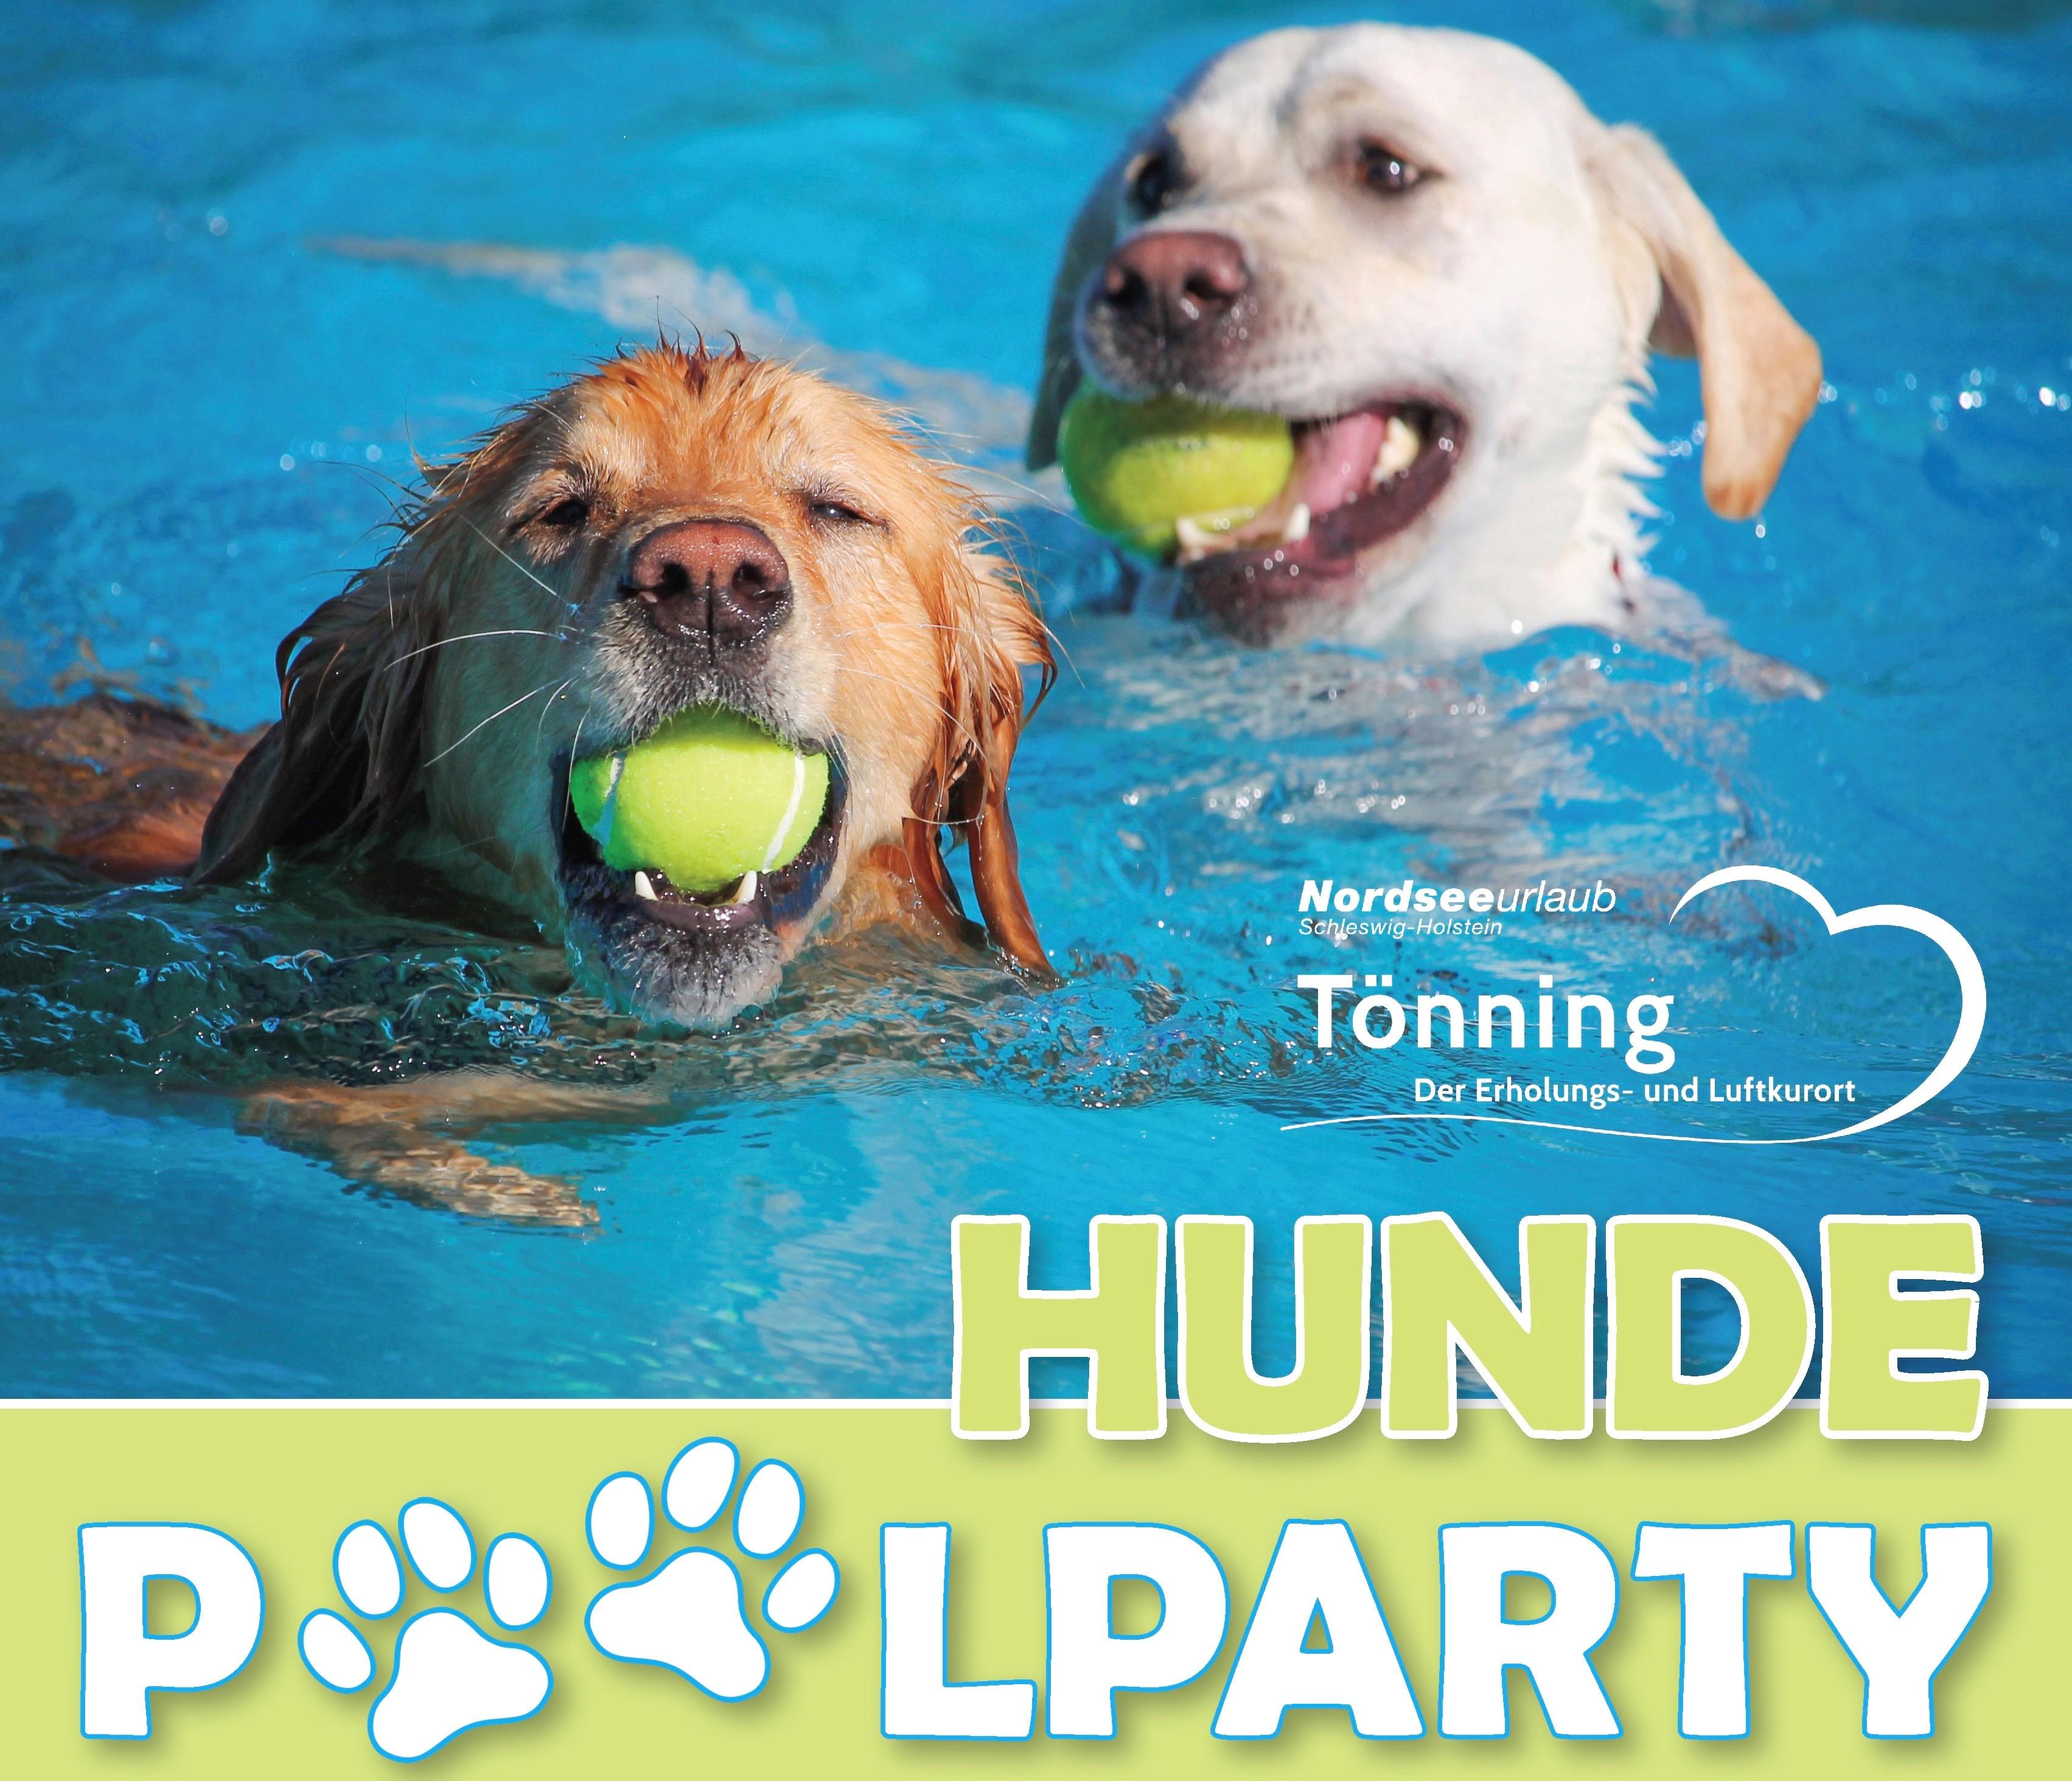 Bild-Hunde-Poolparty-Toenning